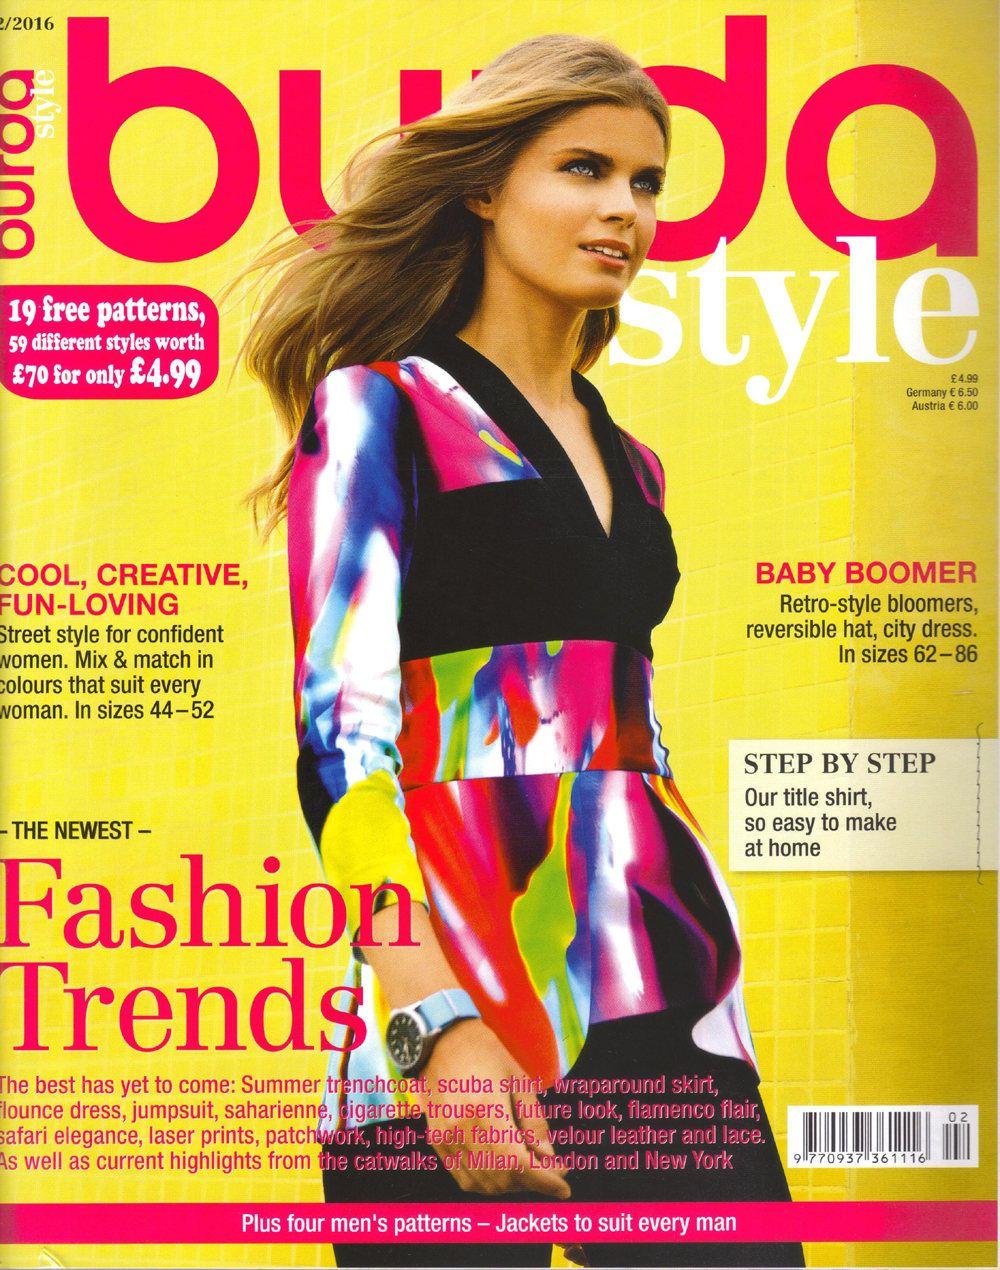 Burda style magazine 22016 english sewing patterns by burda style magazine 22016 english sewing patterns by honeyjamsuniques on etsy jeuxipadfo Image collections